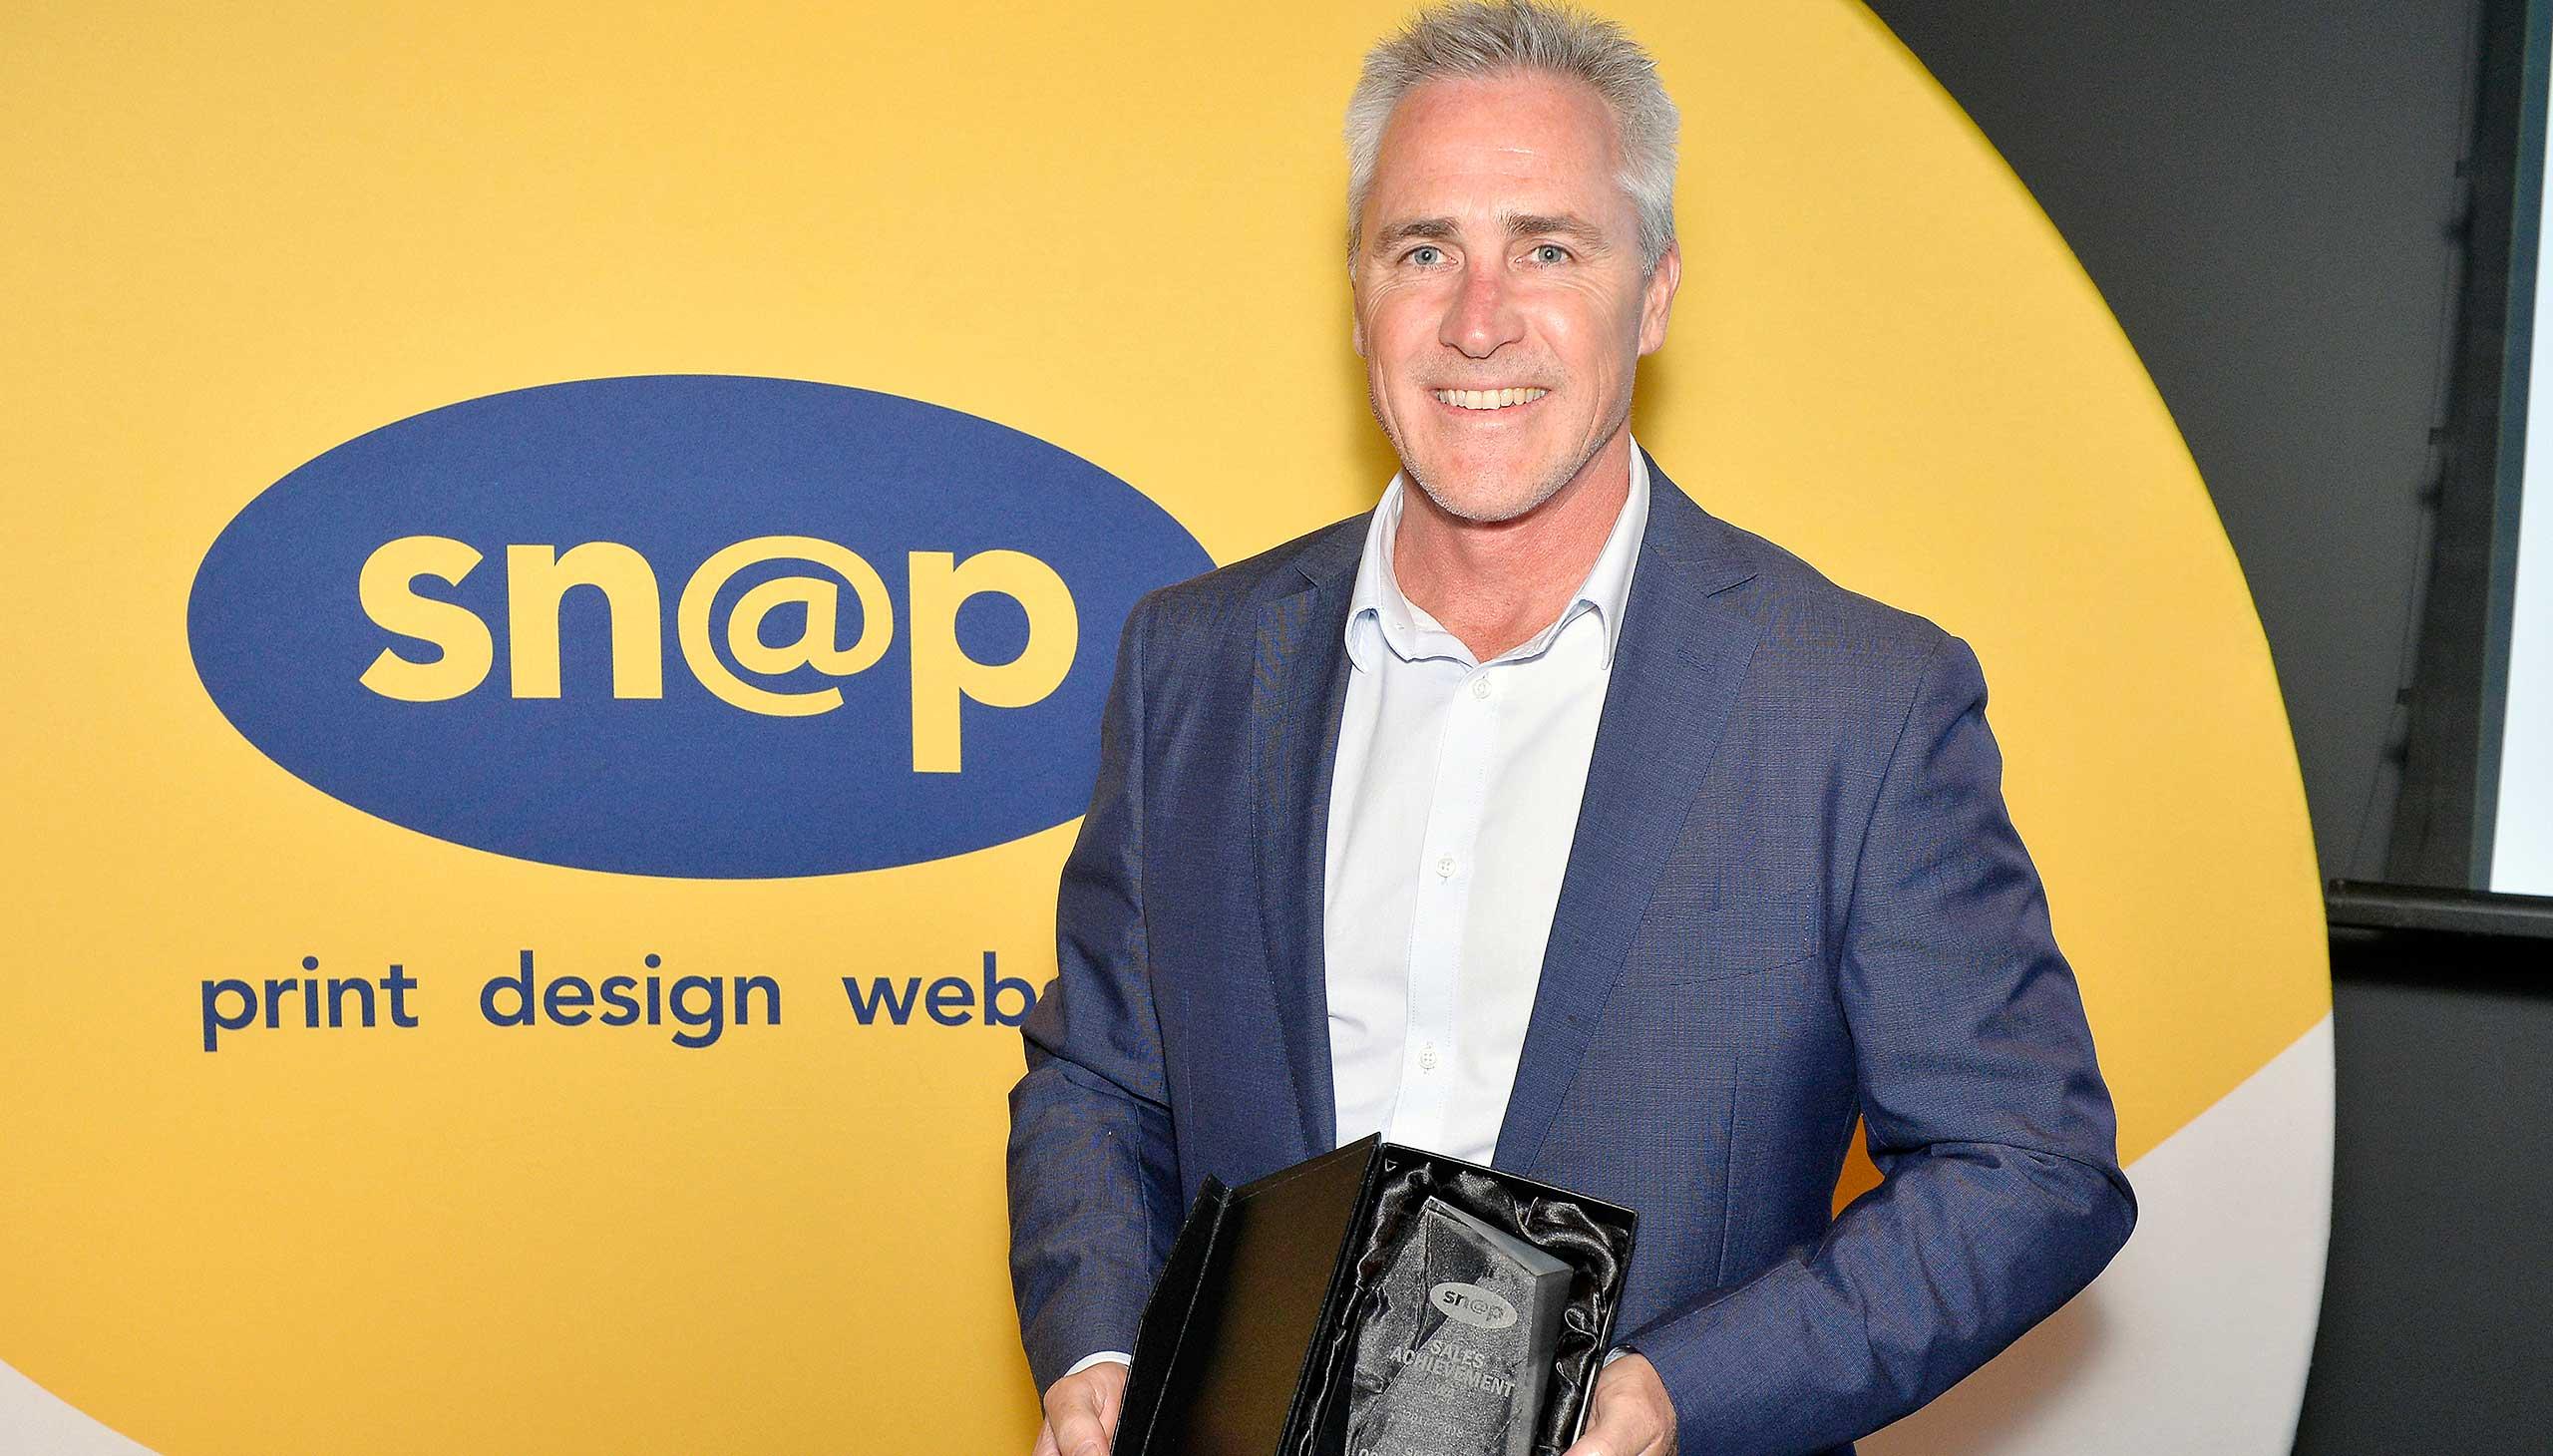 Snap employee receiving an award at event